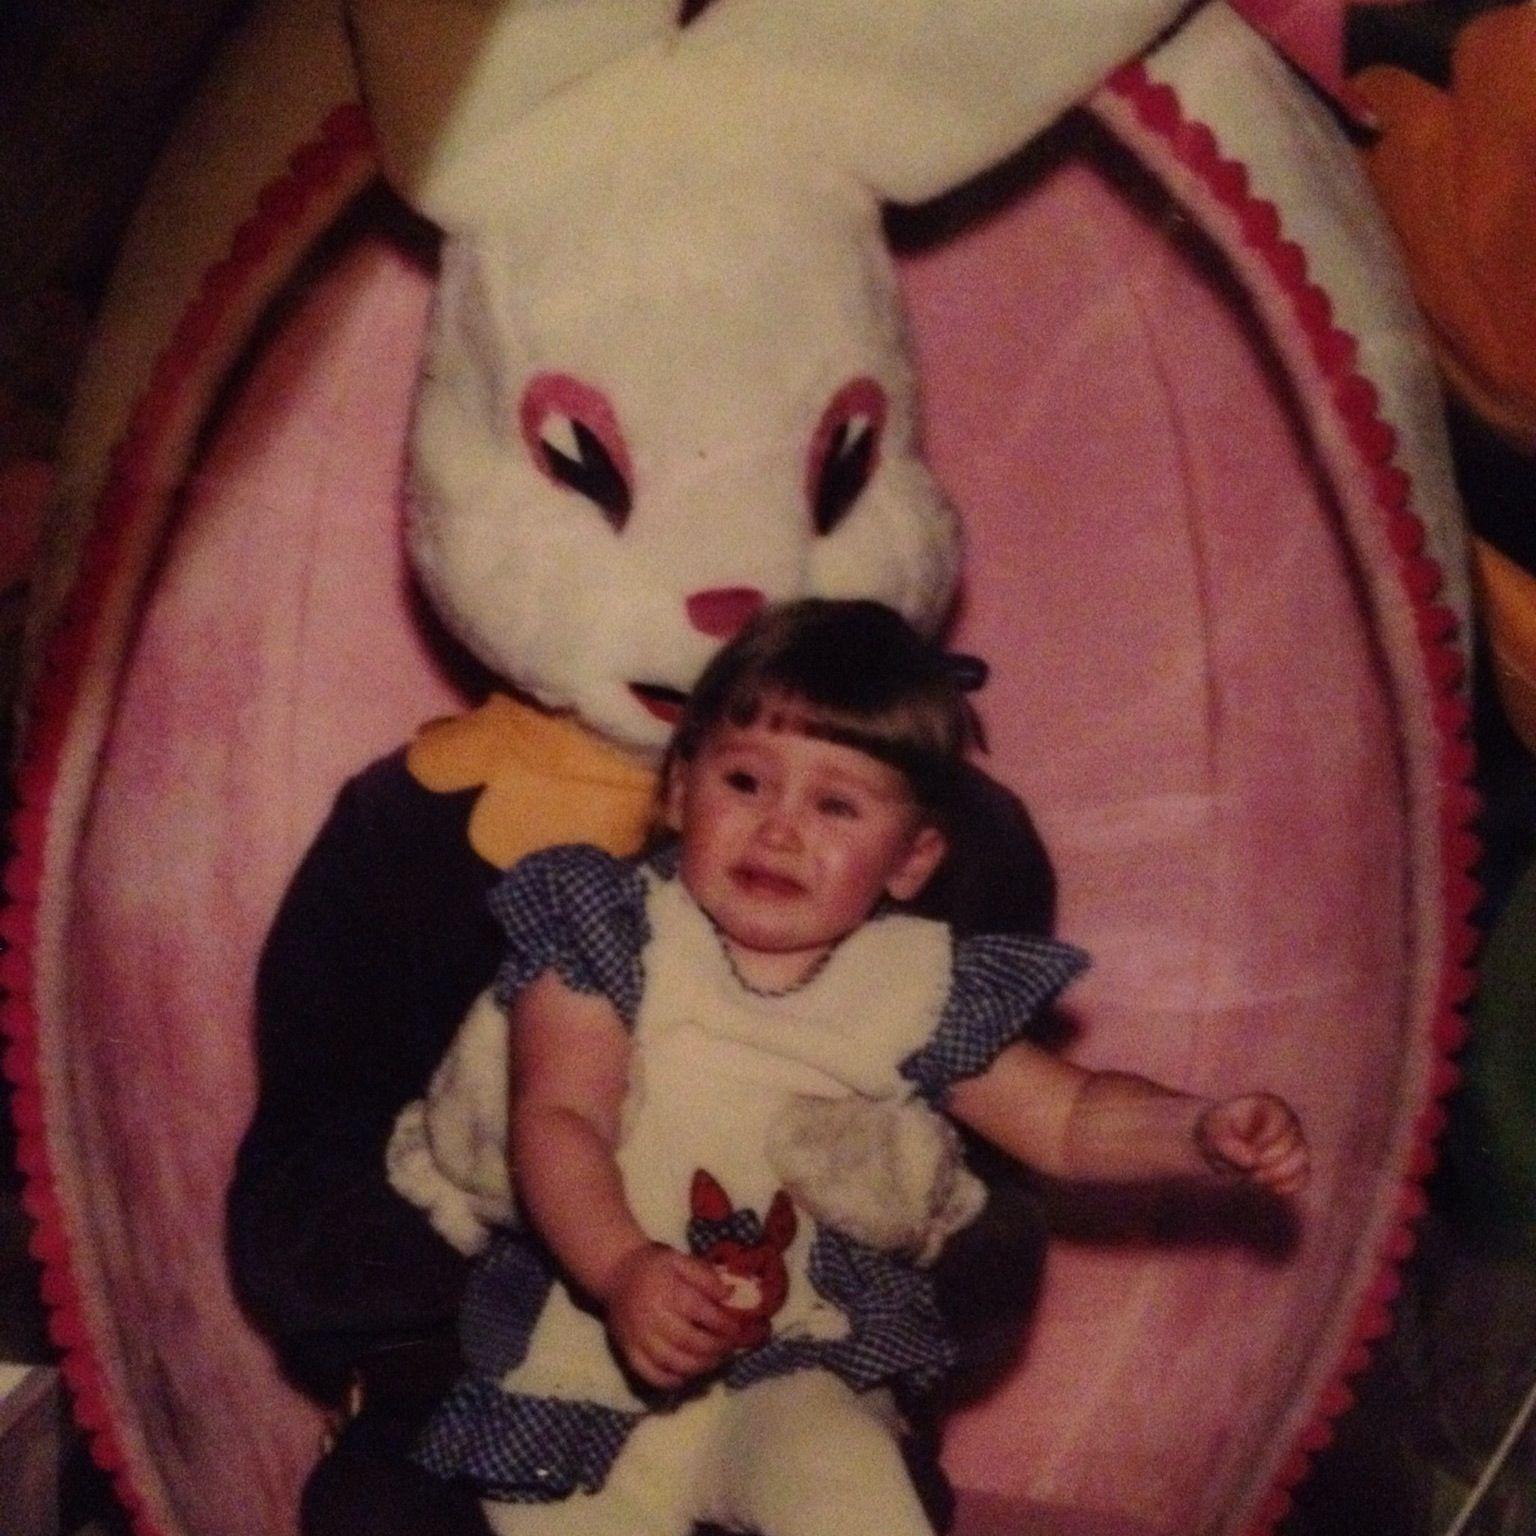 Scary Easter Bunny Photos Creepy easter